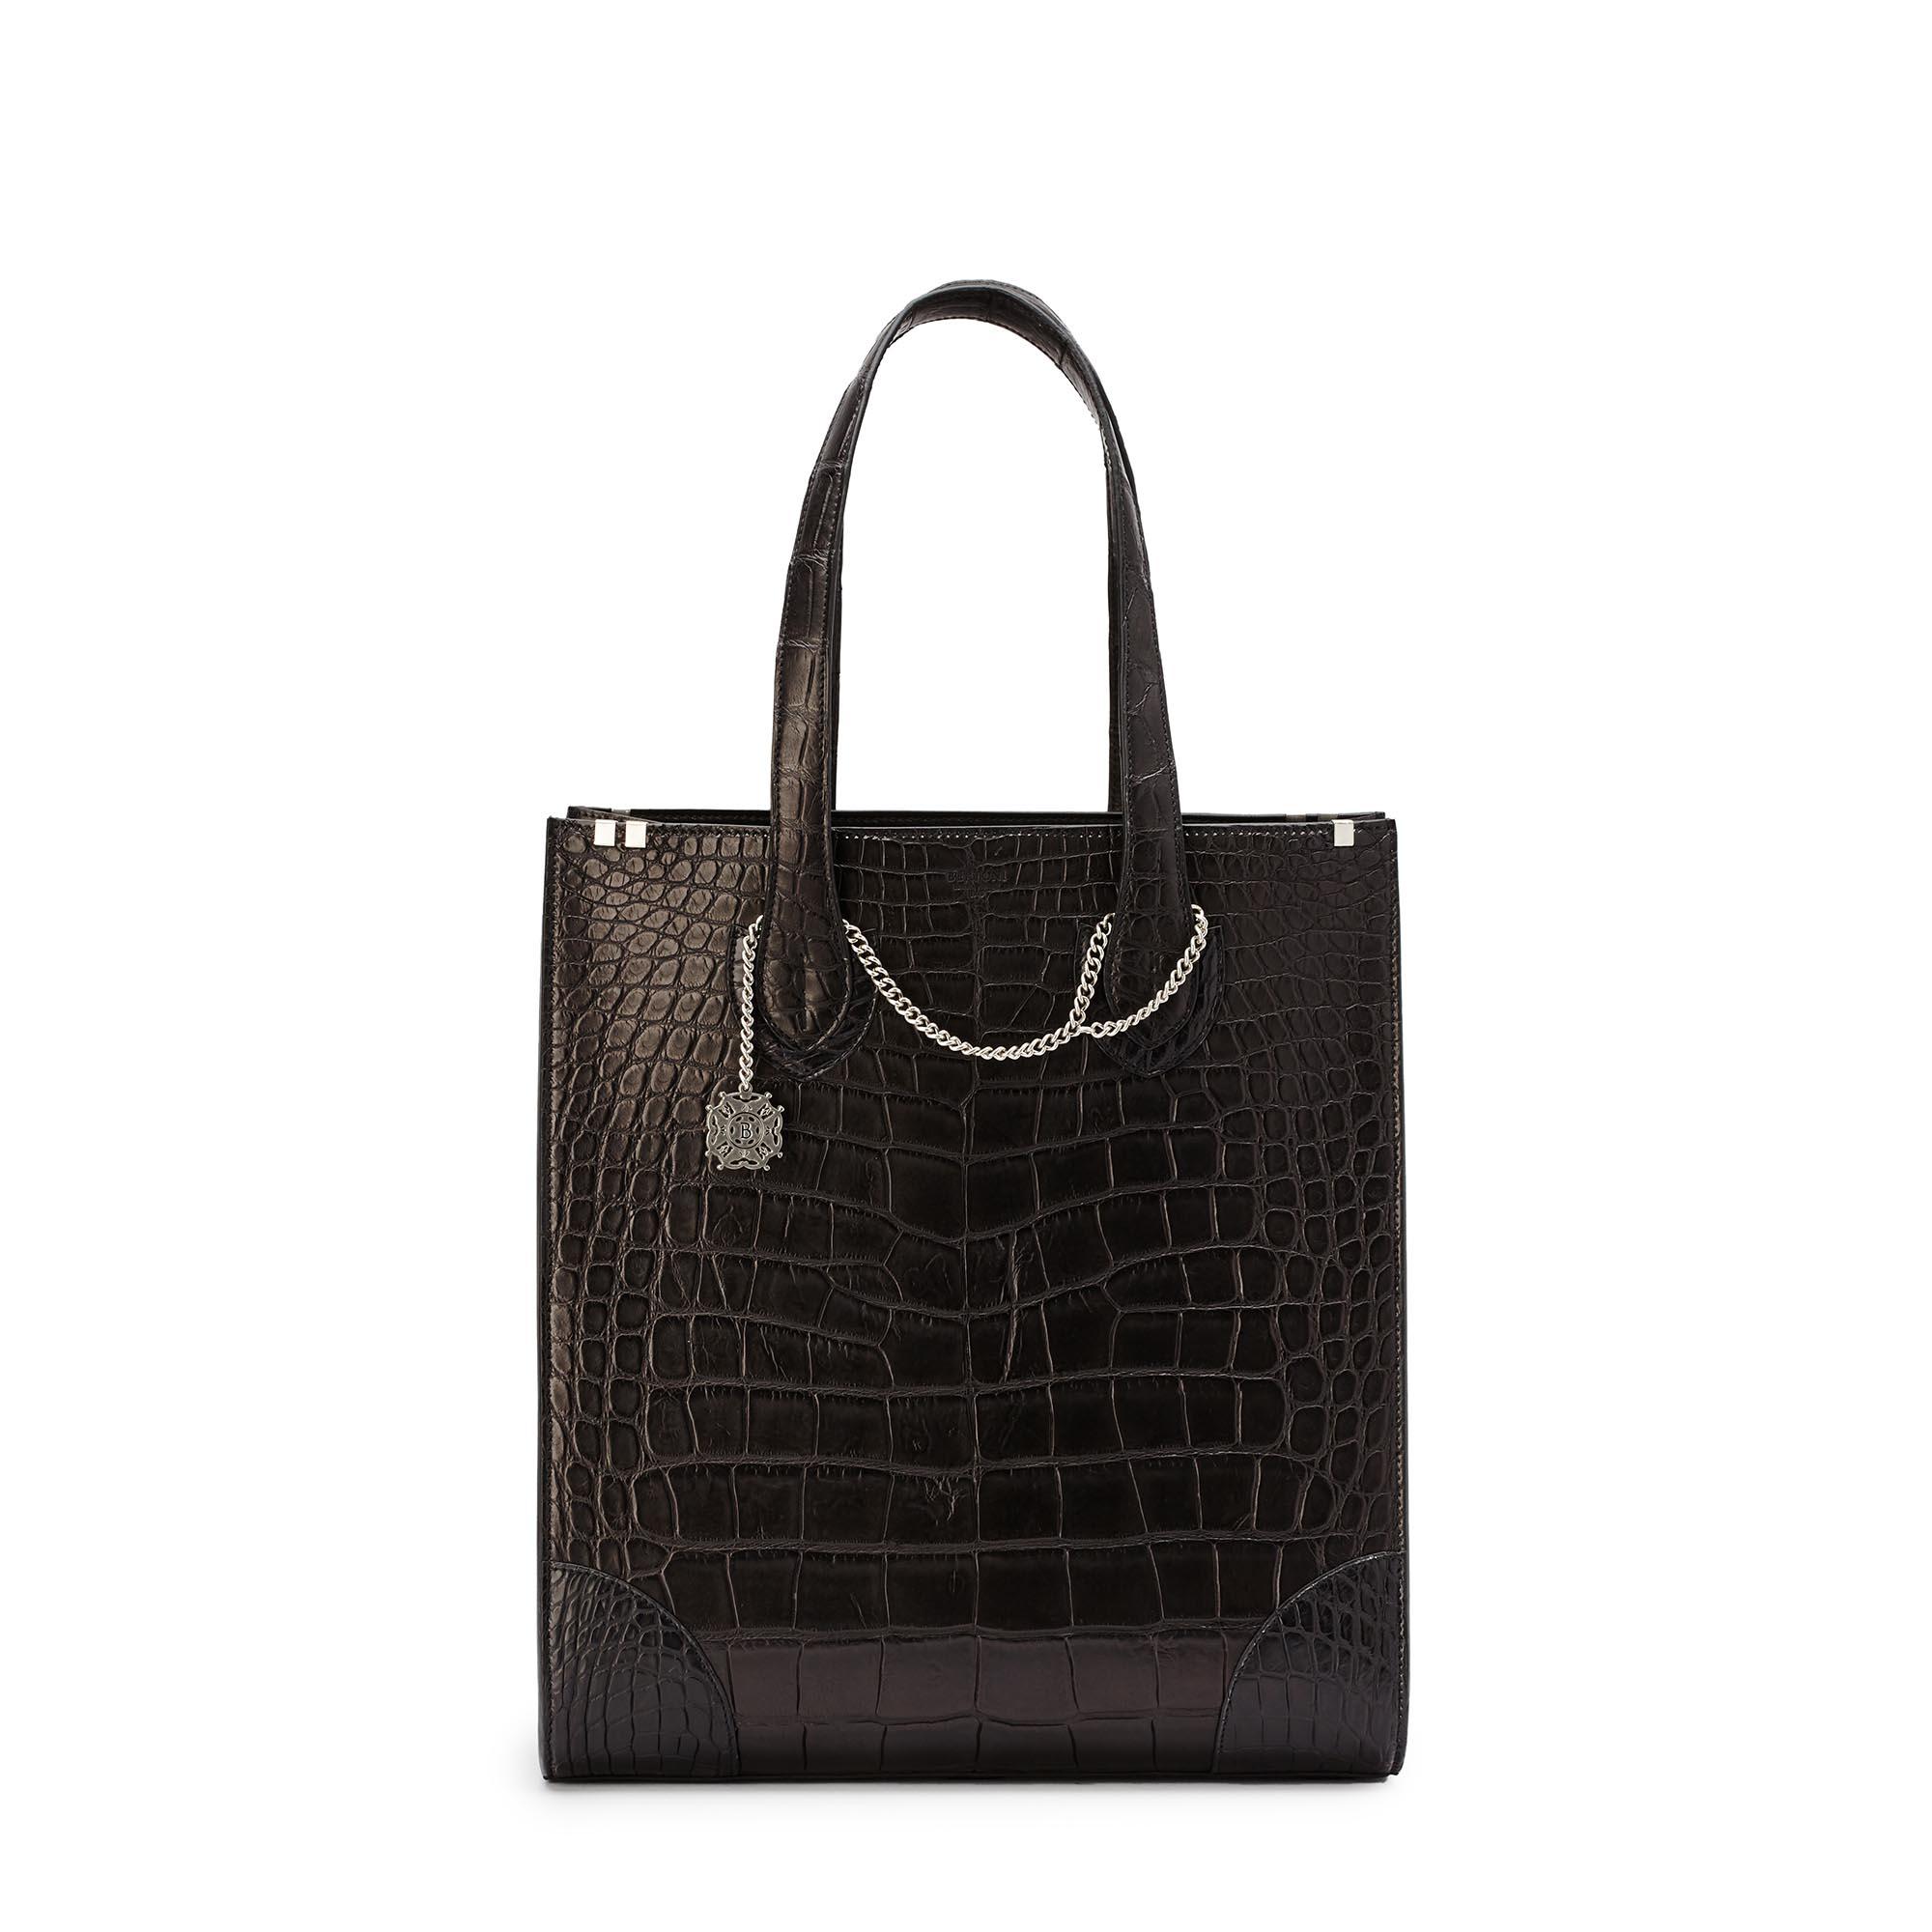 Signatura-Tote-black-alligator-bag-Bertoni-1949